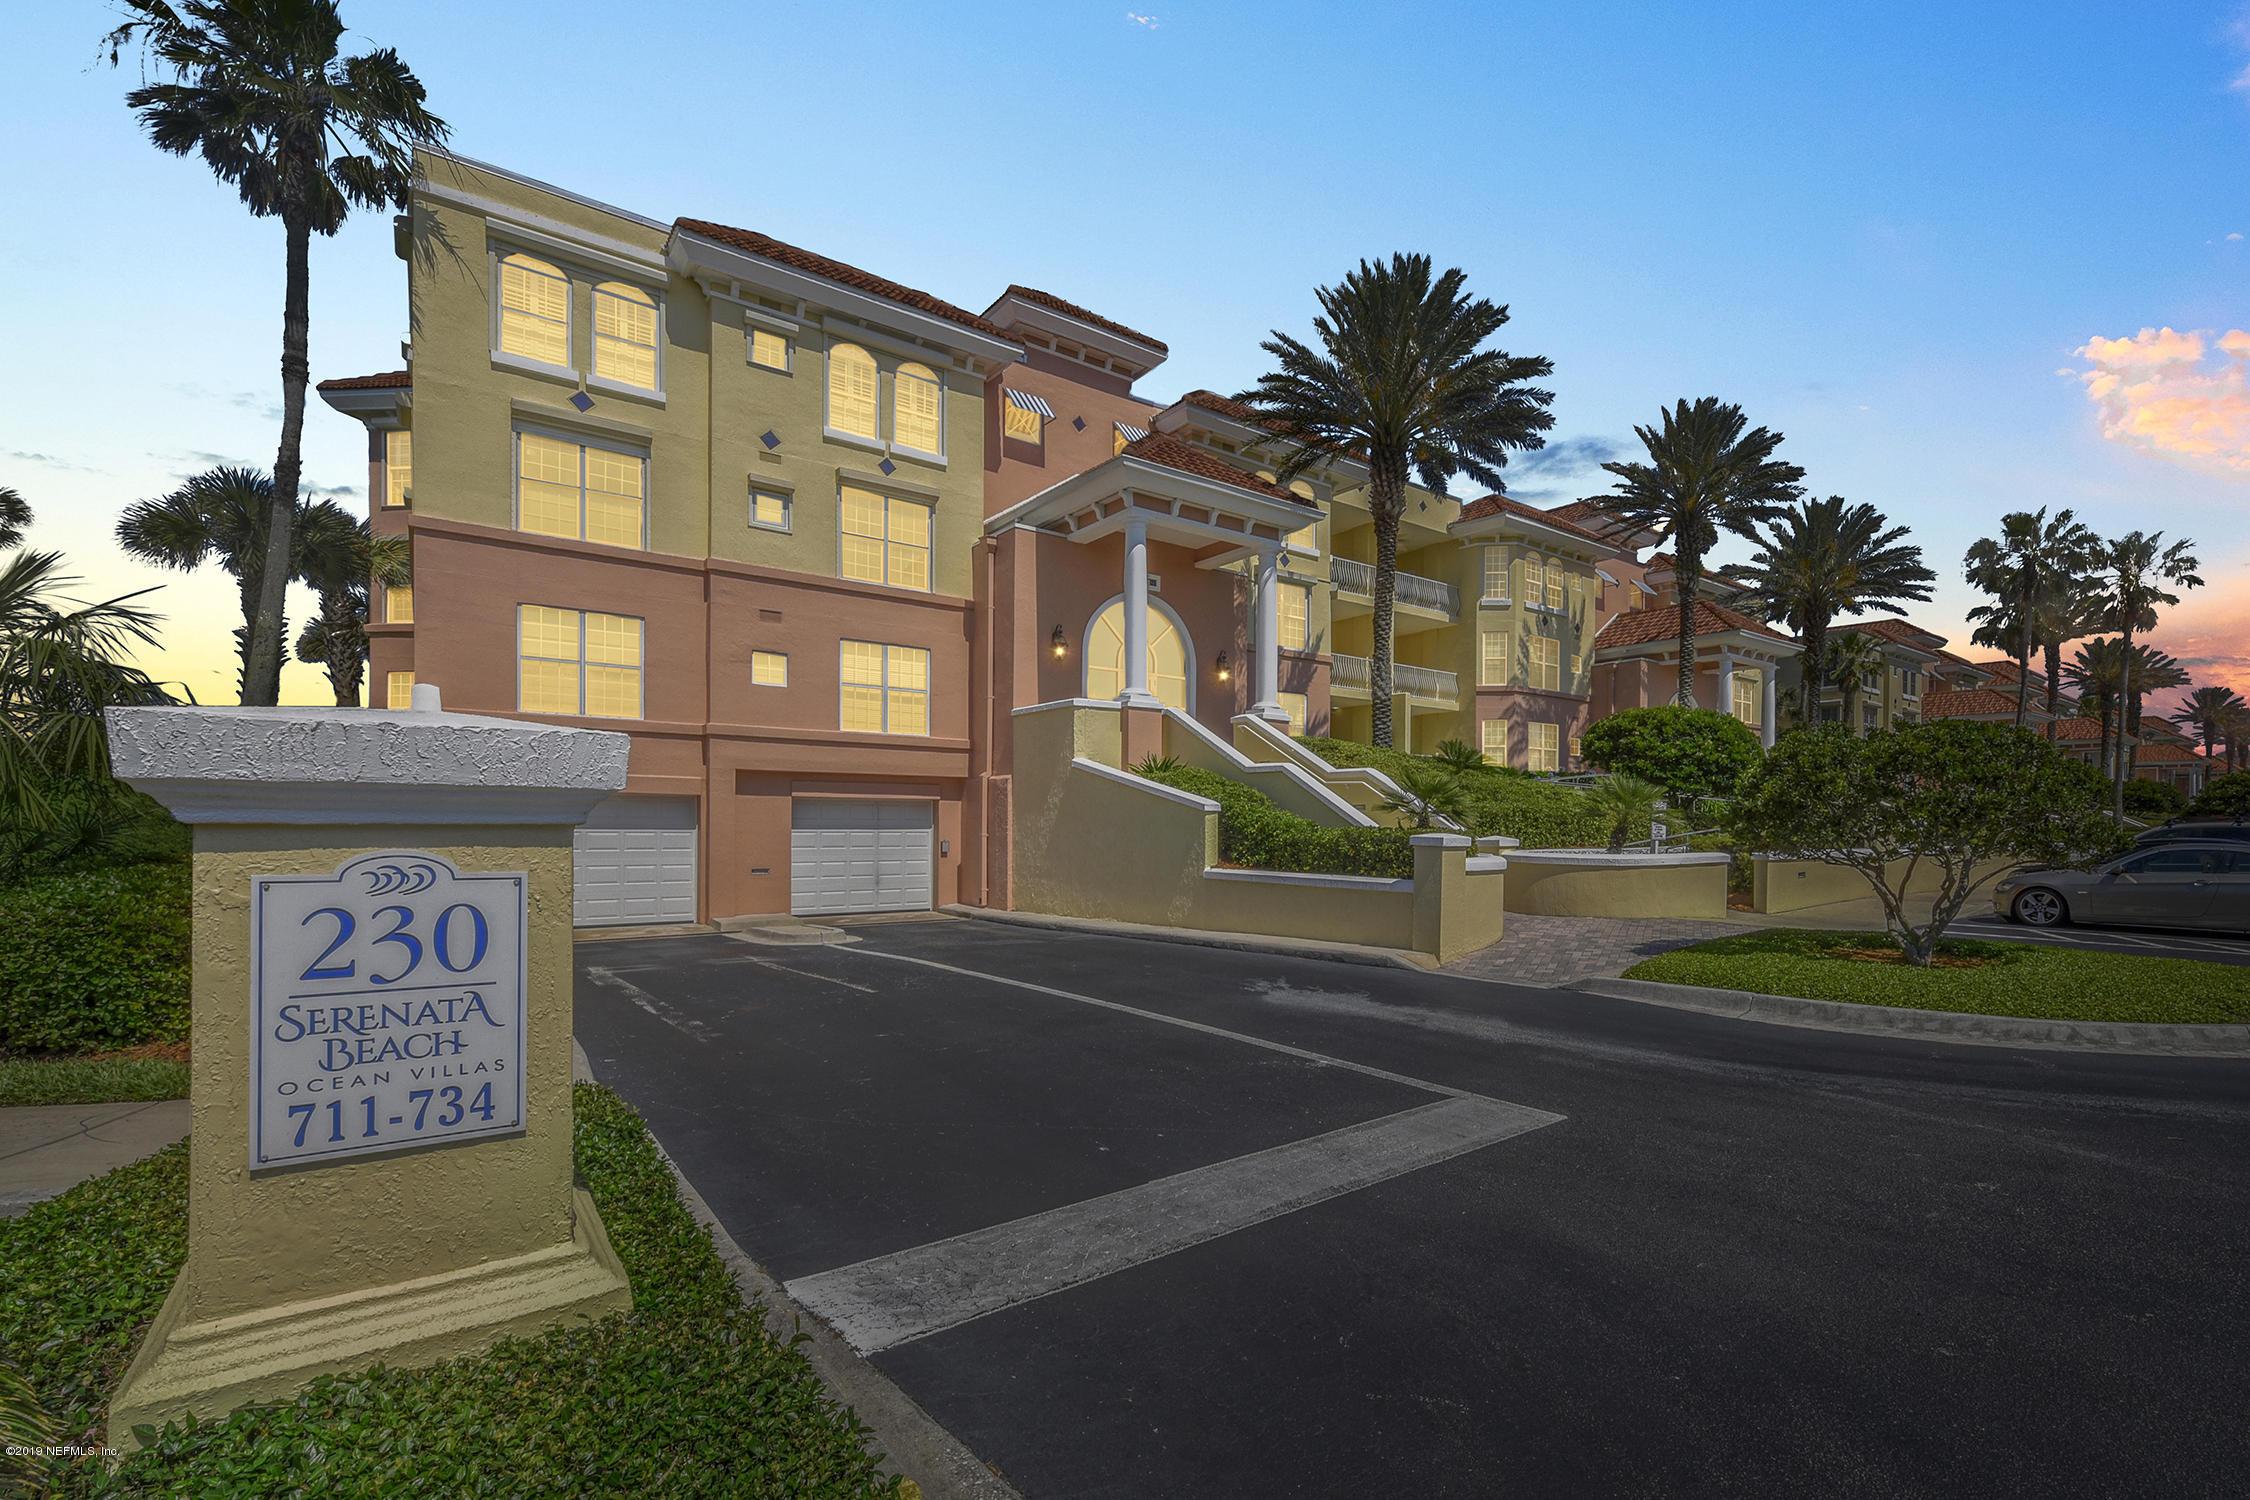 230 SERENATA, PONTE VEDRA BEACH, FLORIDA 32082, 3 Bedrooms Bedrooms, ,3 BathroomsBathrooms,Condo,For sale,SERENATA,996519